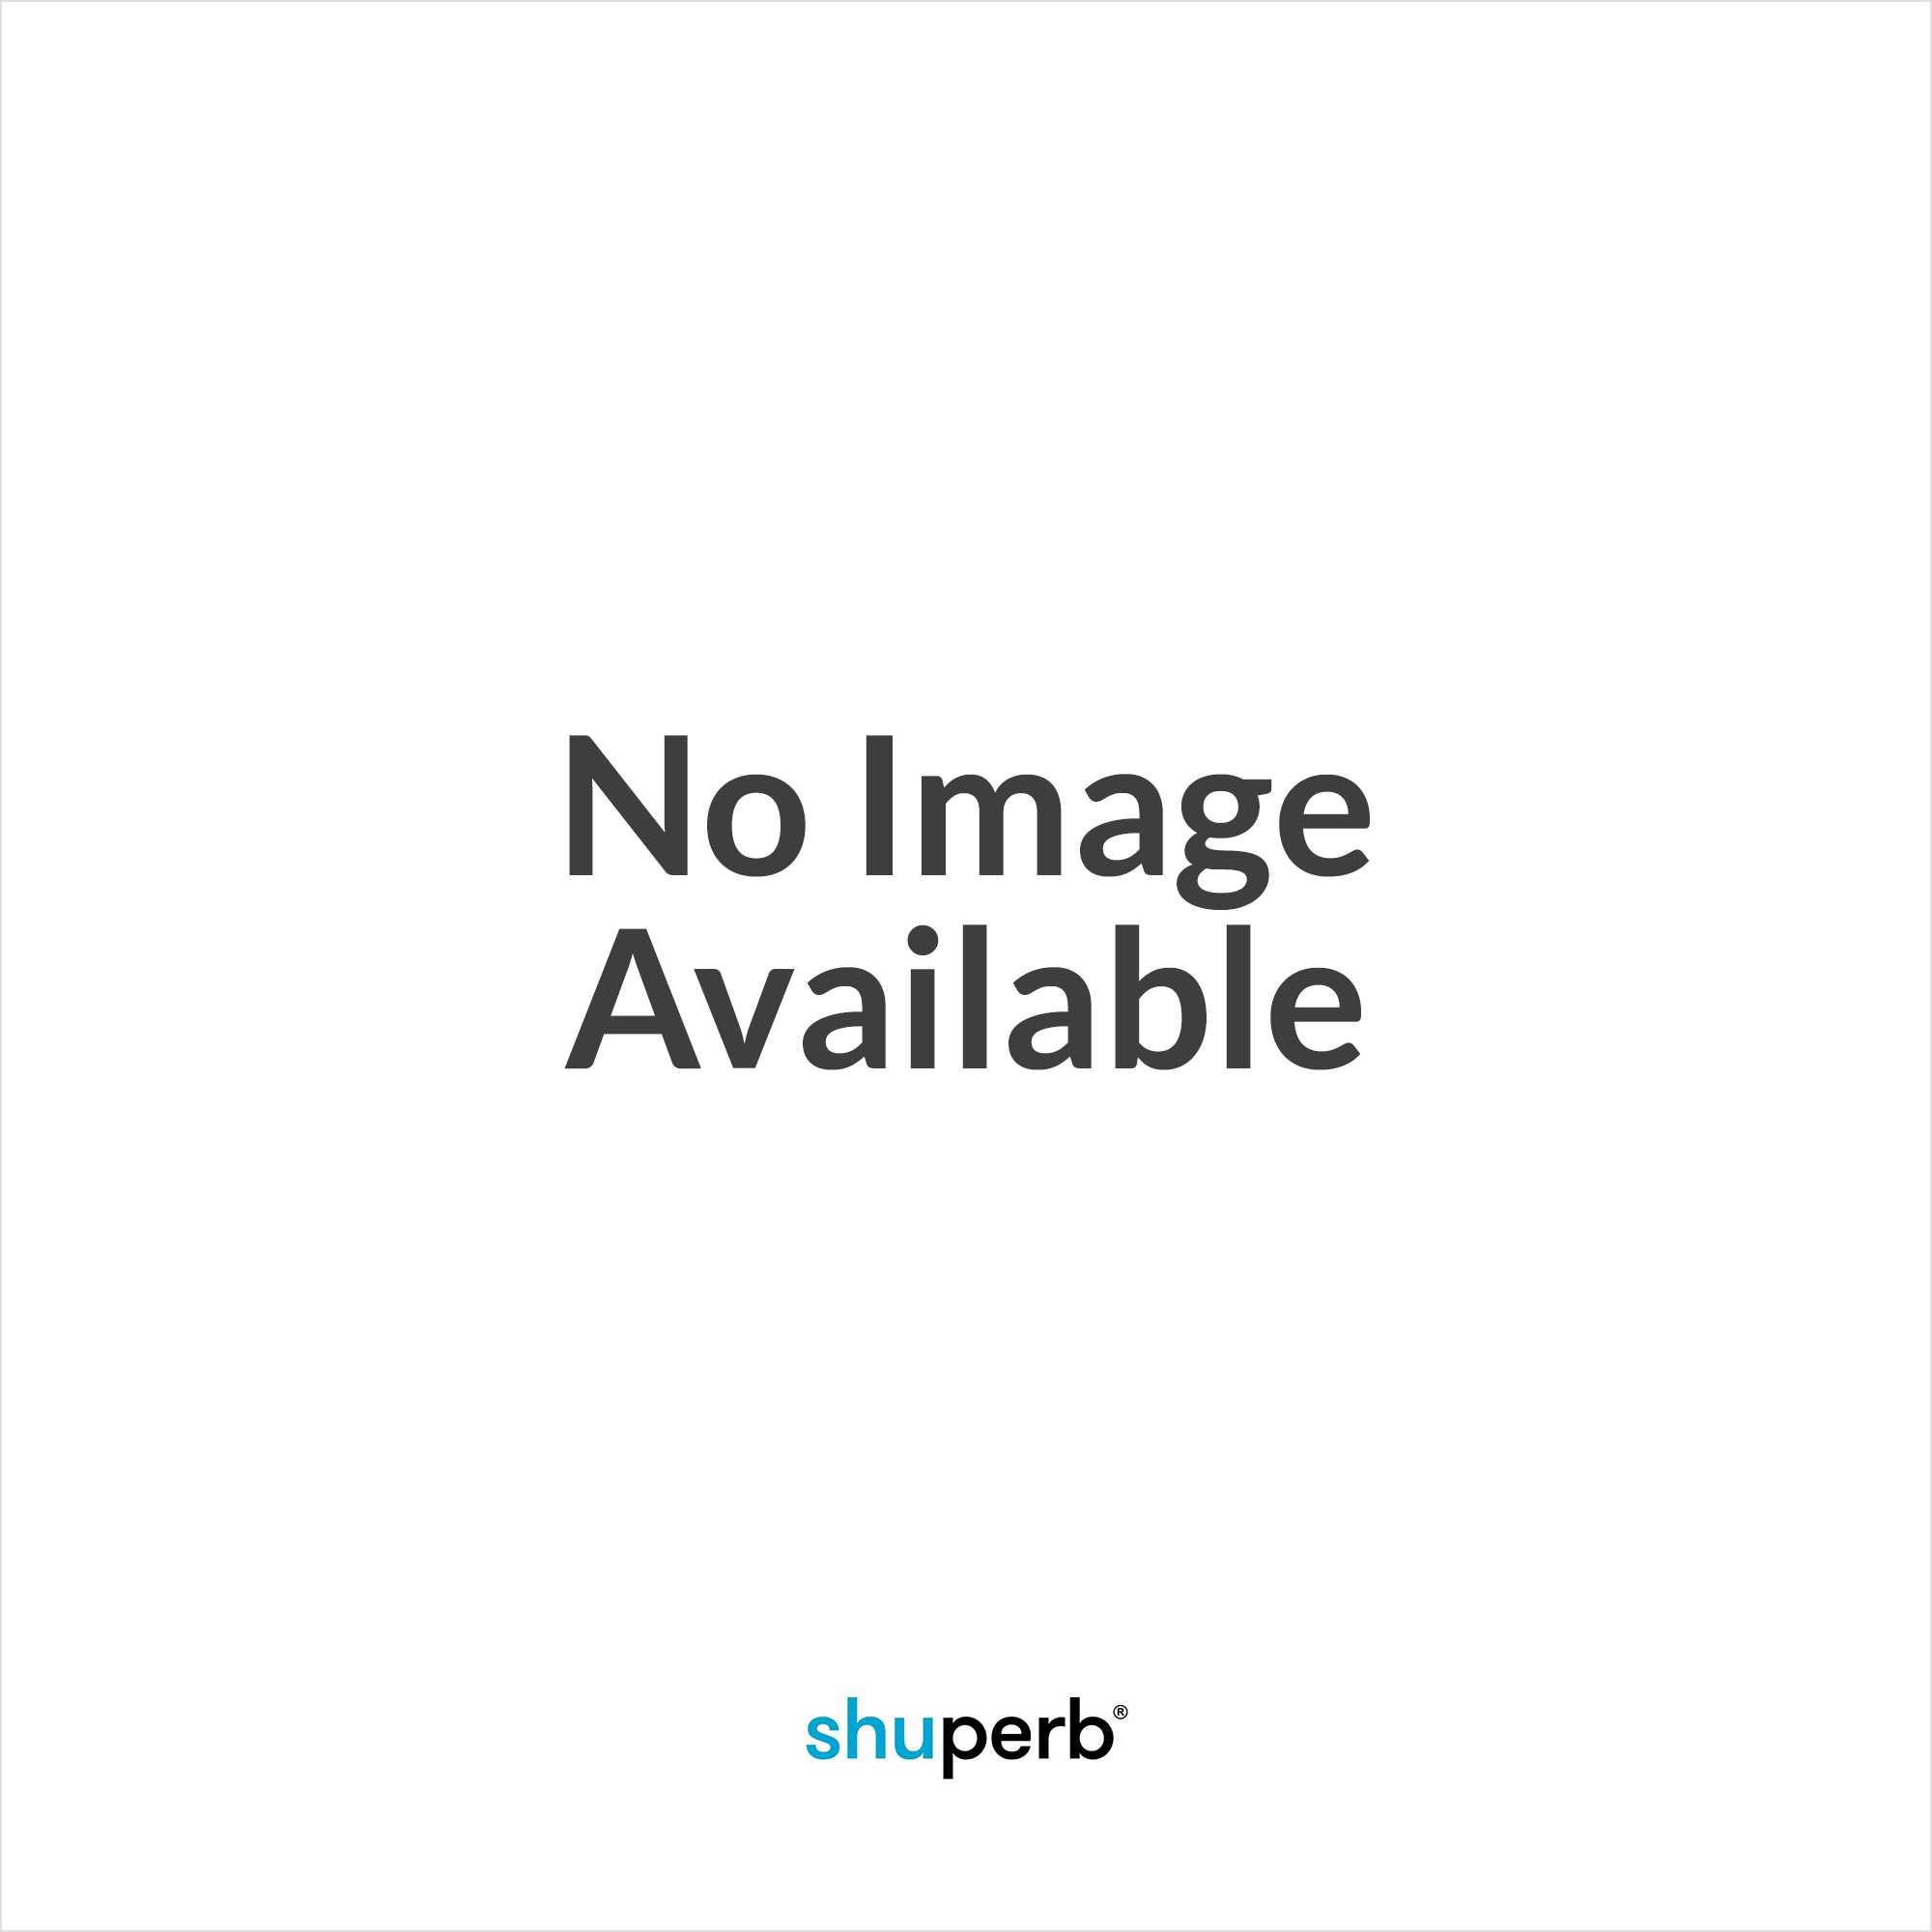 bba68e00c32 Base London WOBURN Mens Leather Brogue Shoes Oxblood